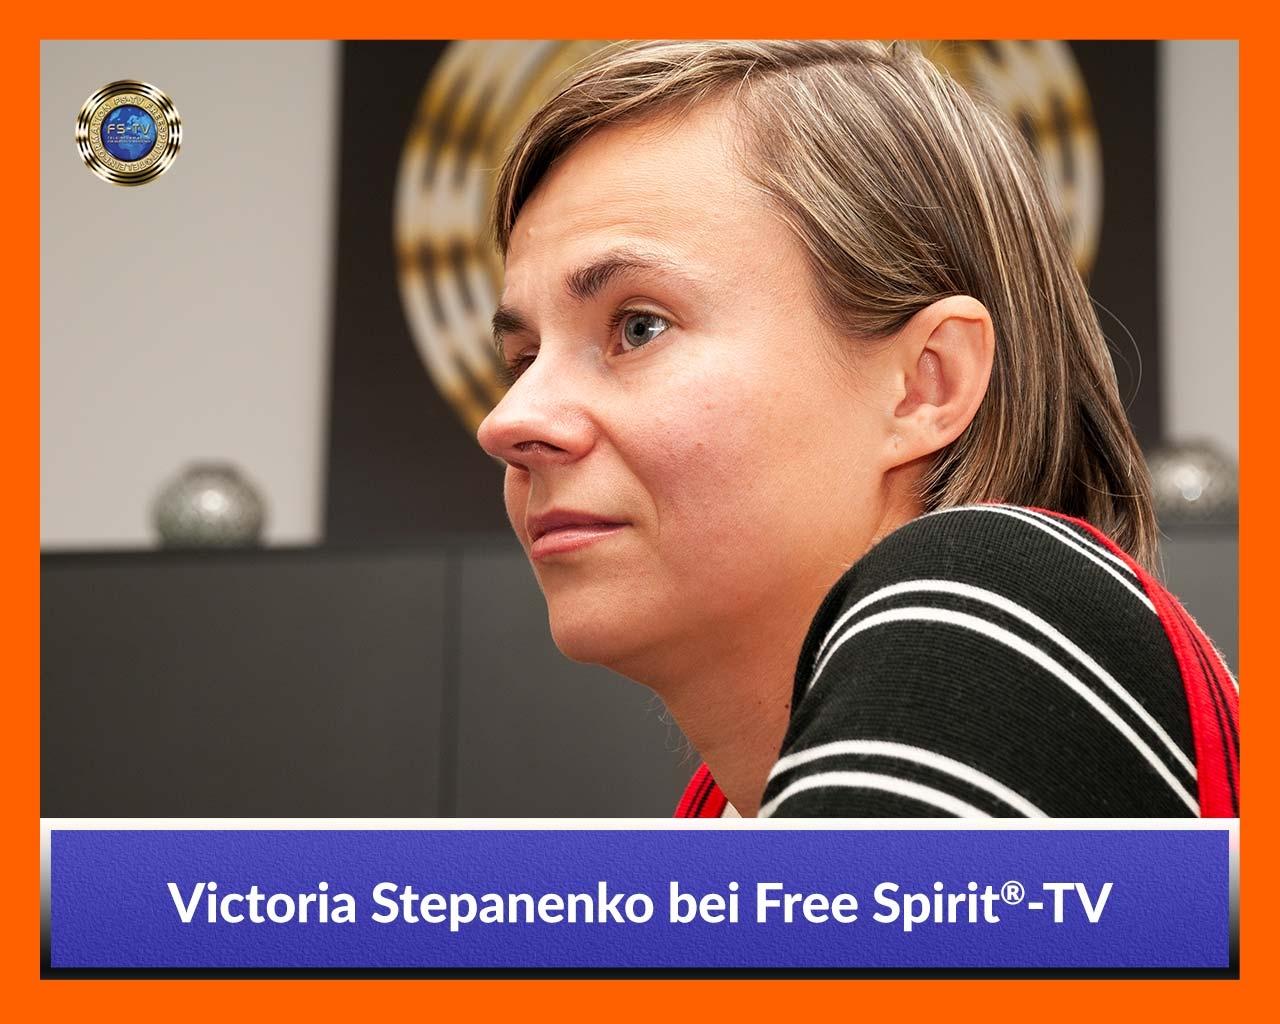 Galleriebild-Victoria-Stepanenko-02